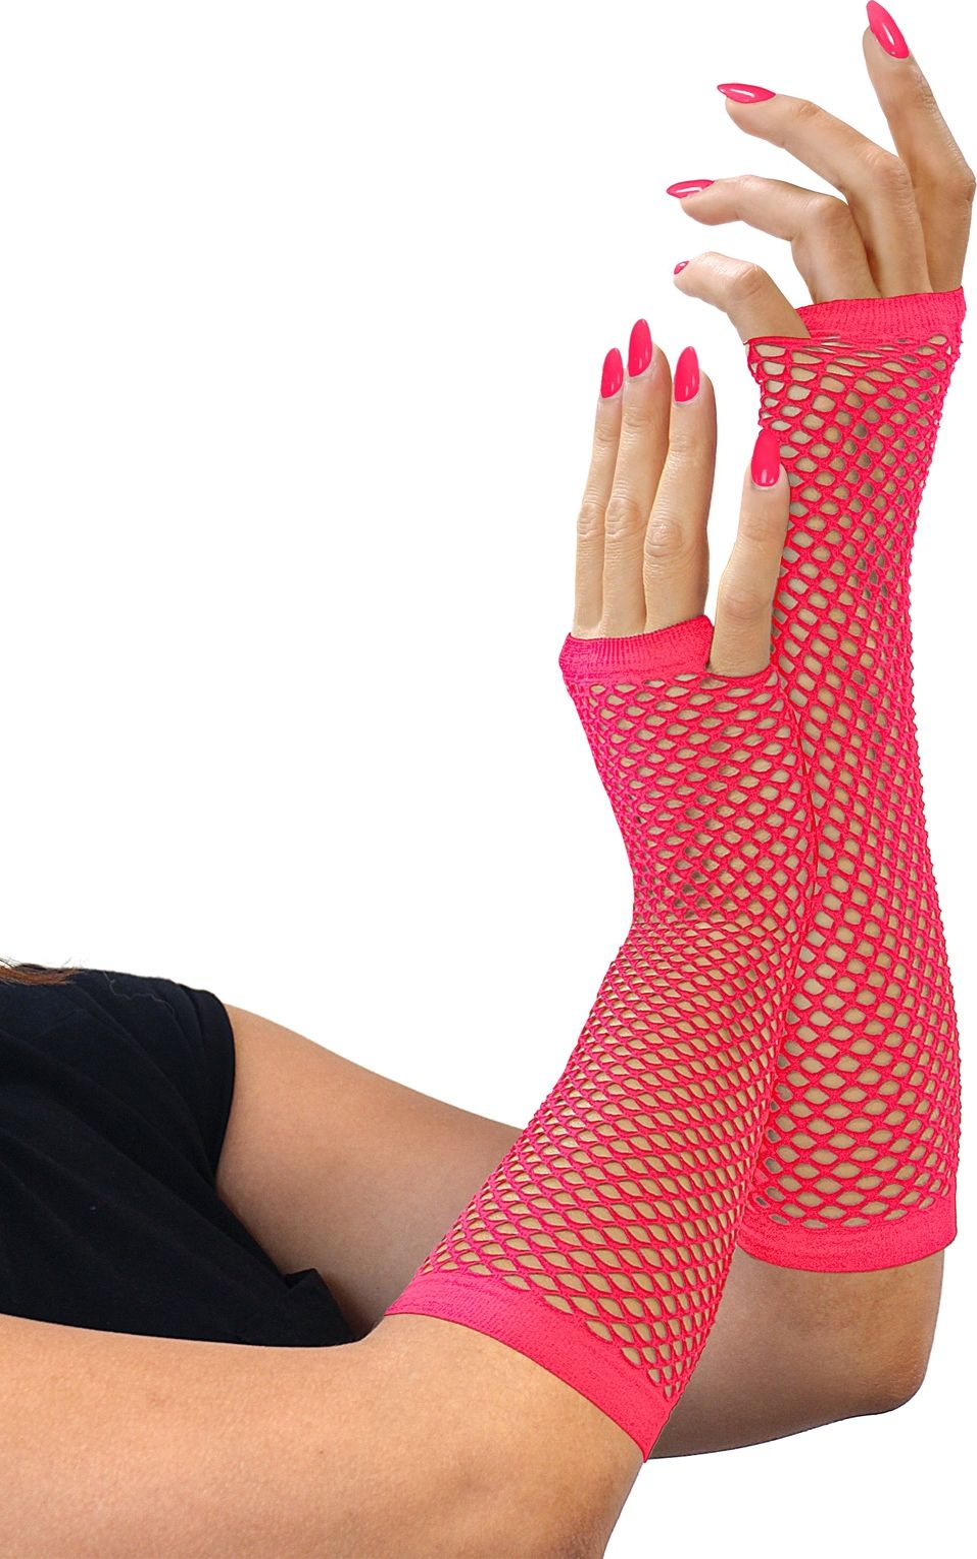 Neon roze lange vingerloze nethandschoenen